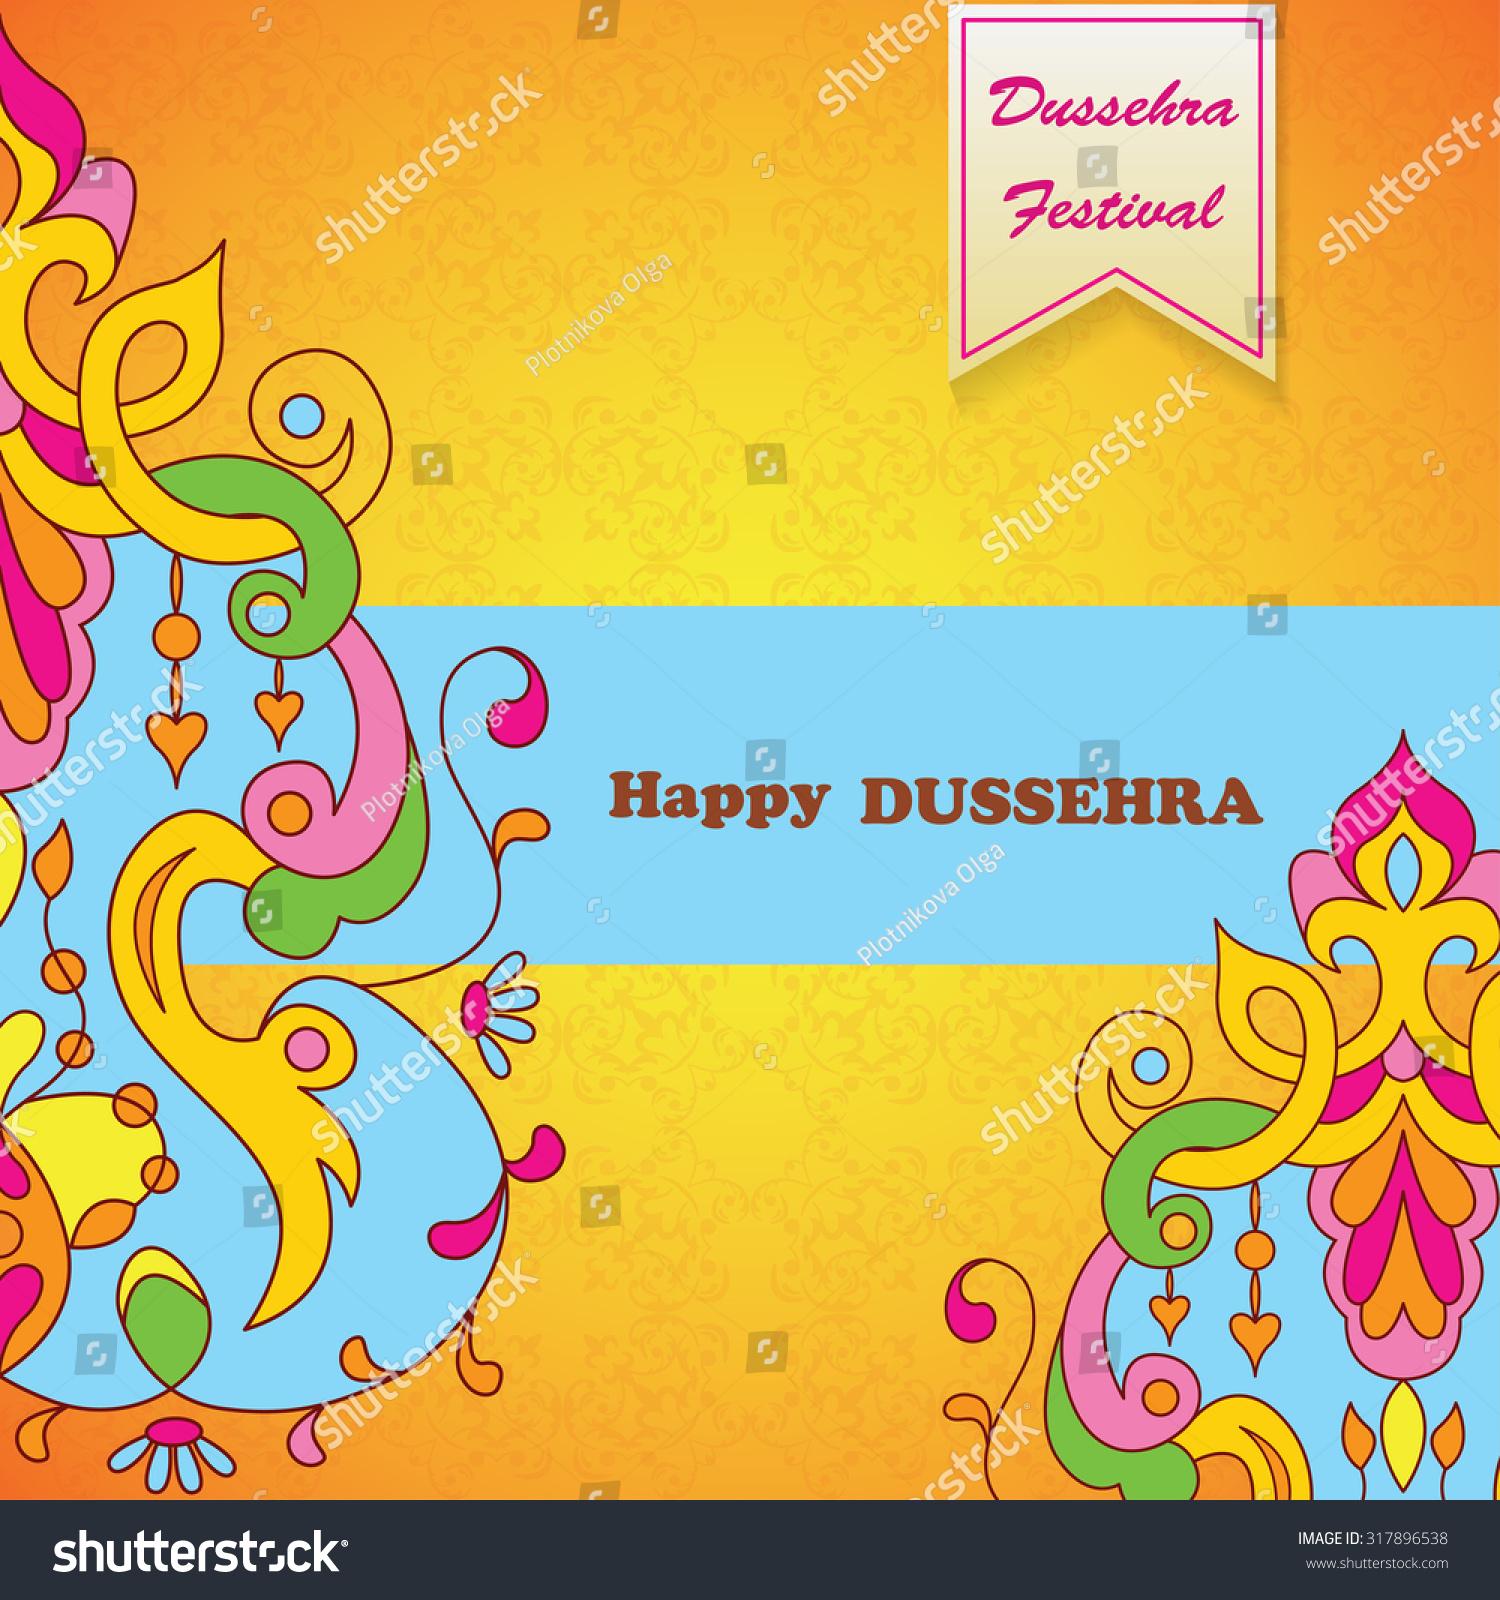 Dussehra festival background greeting card dussehra celebration dussehra festival backgroundeeting card for dussehra celebration in india m4hsunfo